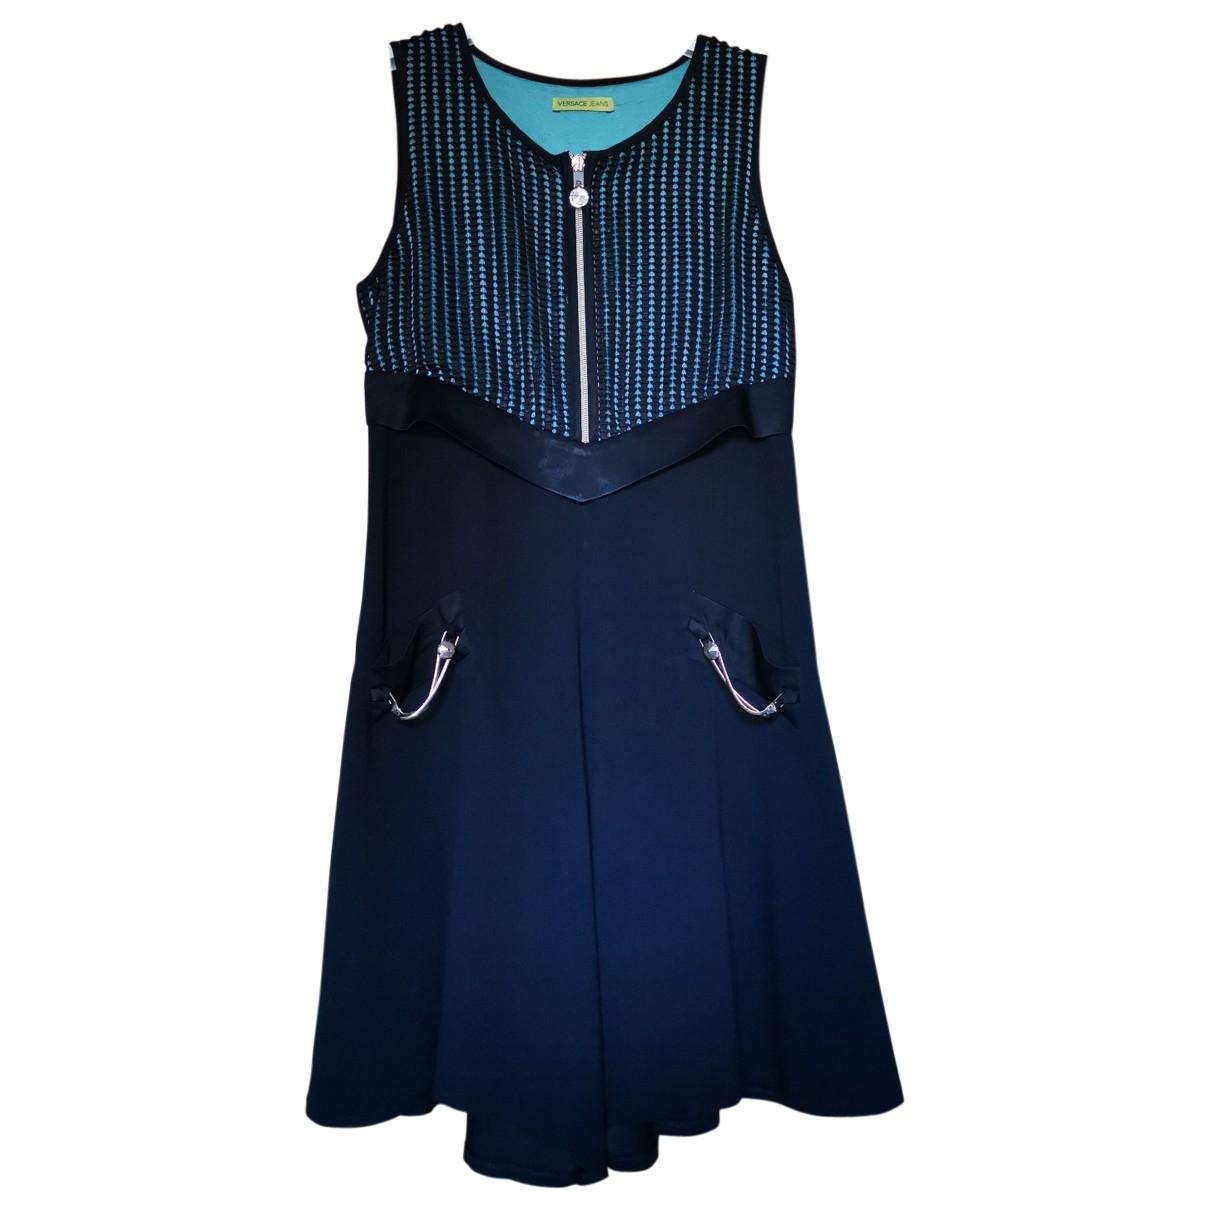 Armani Jeans \N Multicolour dress for Women 40 IT